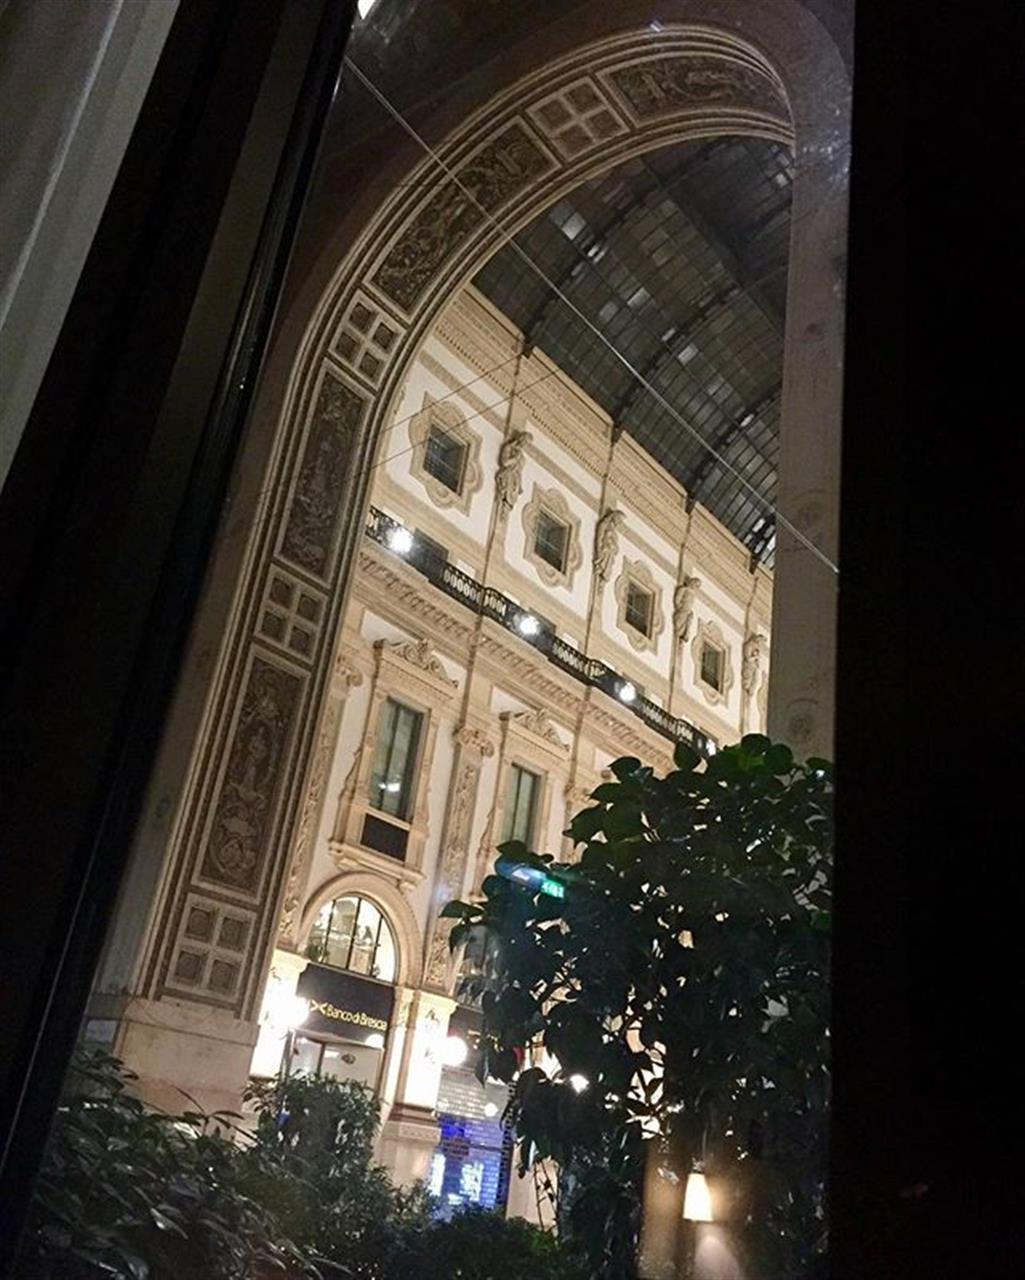 Galleria Vittorio Emanuele from the hotel #parkhyatt in #milan #leadingrelocal #giorgioviganorealestate #thingstovisit #thingstodo #milano #solocosebelle #beautiful & #special #?asterpiece